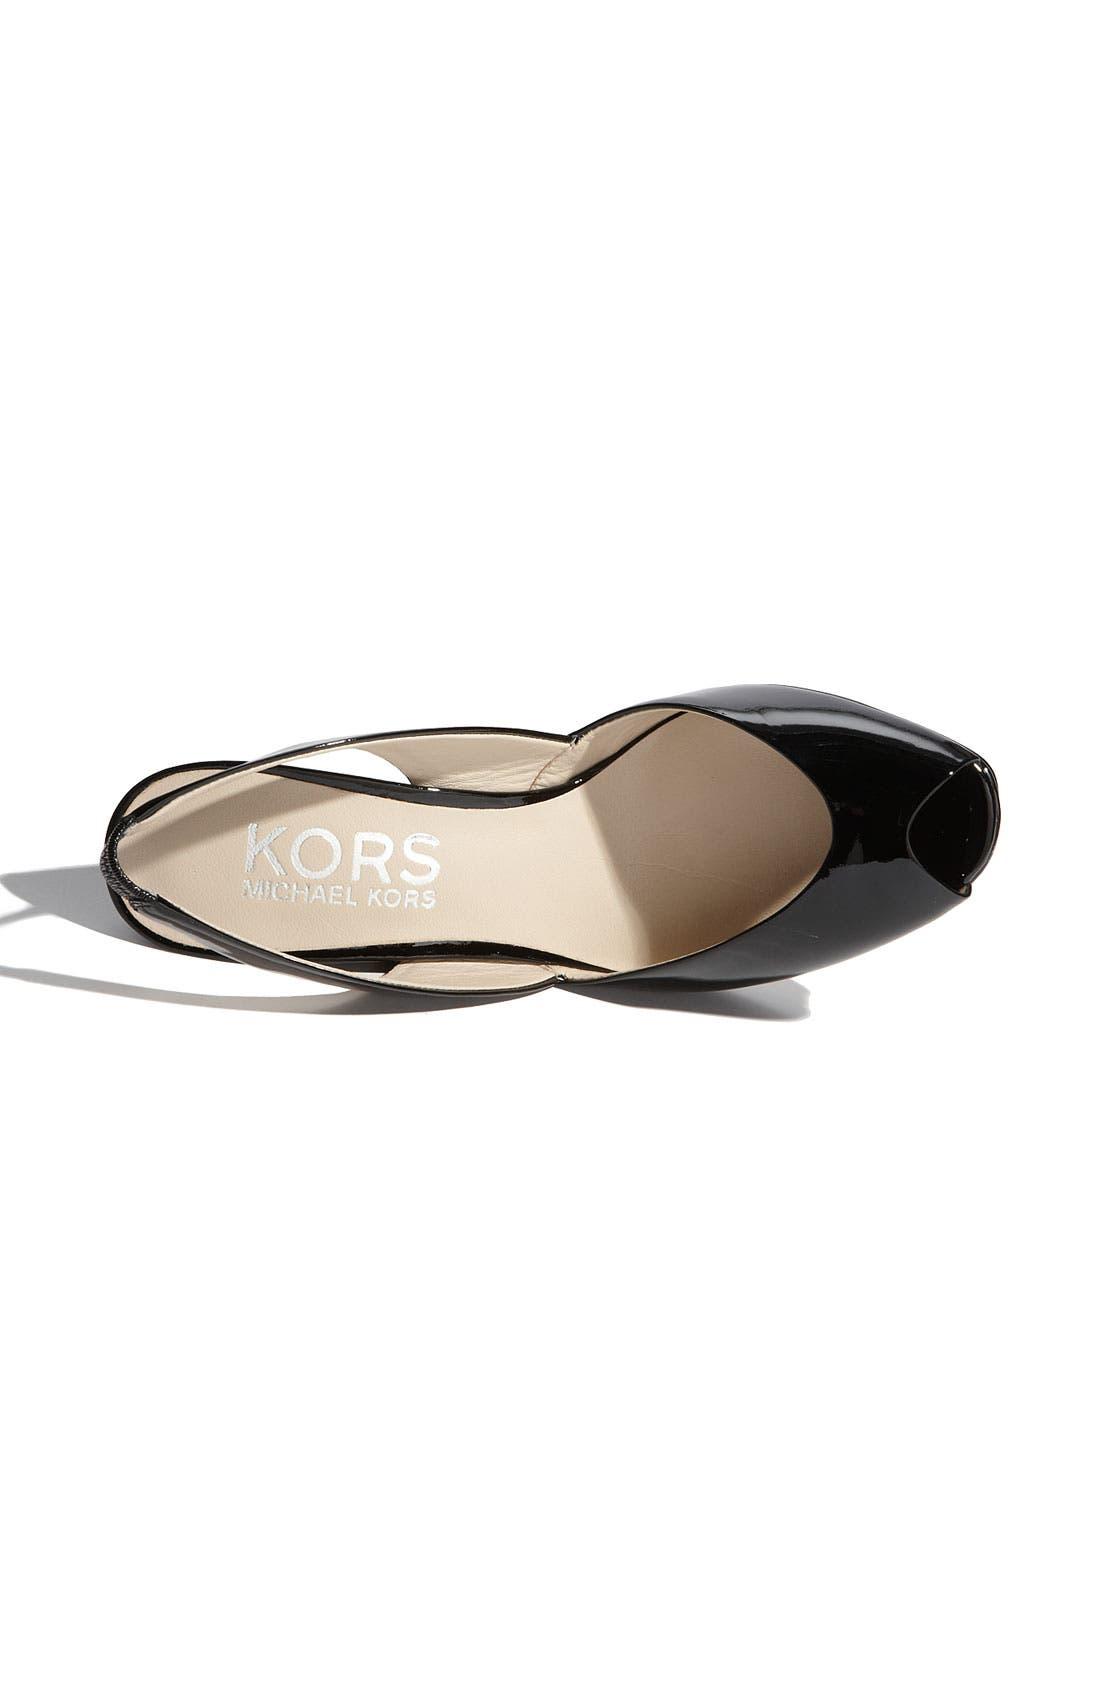 Alternate Image 3  - KORS Michael Kors 'Vivian' Wedge Sandal